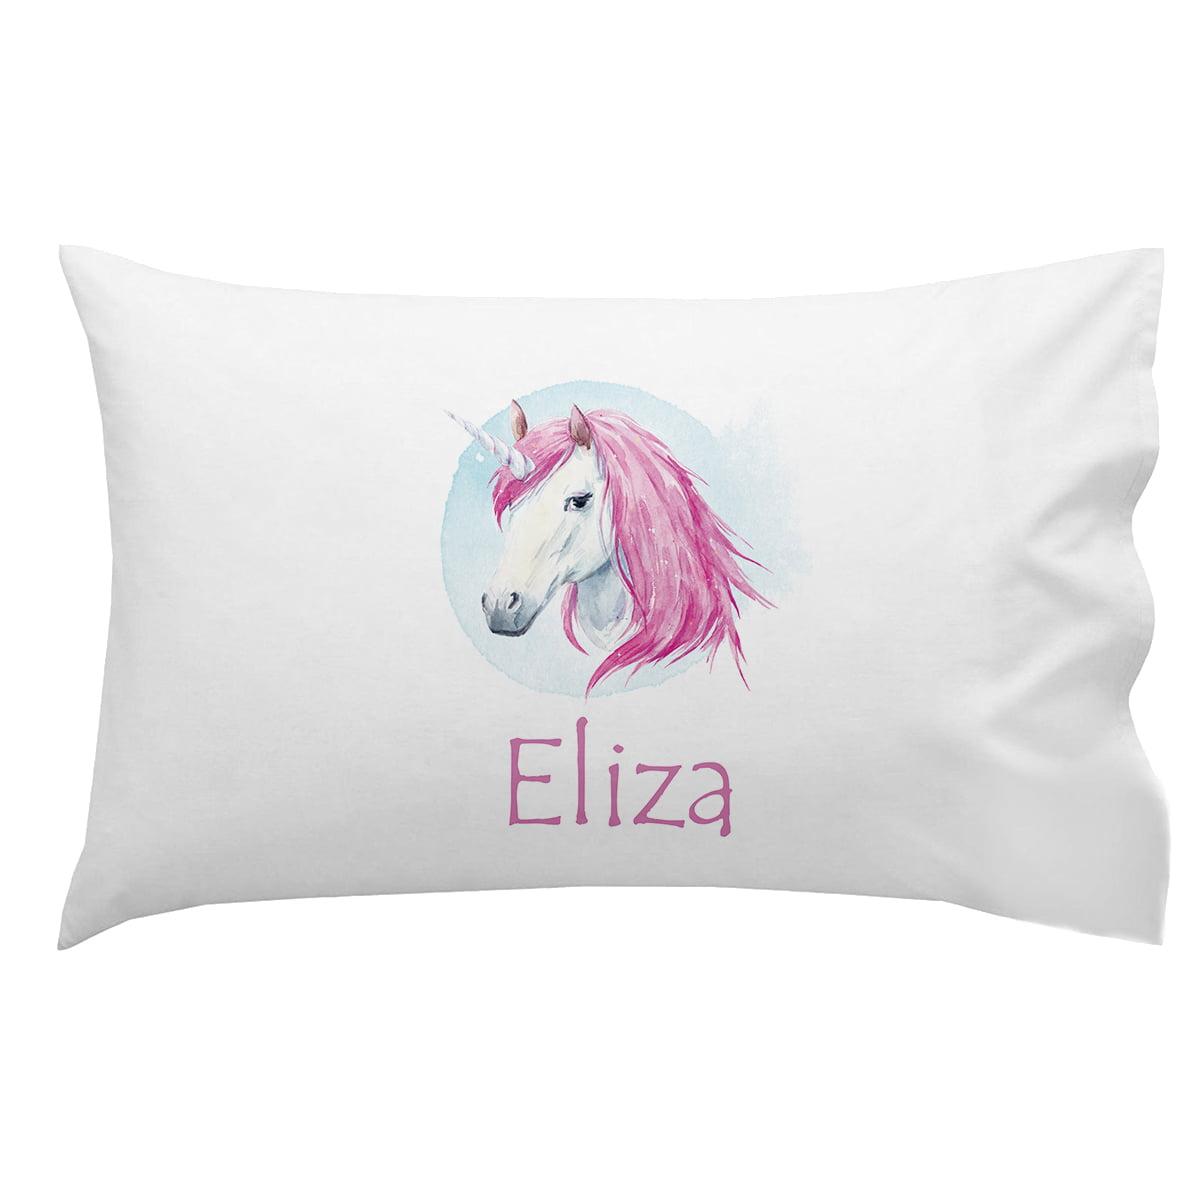 Lifestyles By Ramco Personalized Monogrammed Unicorn Pillowcase For Kidz Walmart Com Walmart Com